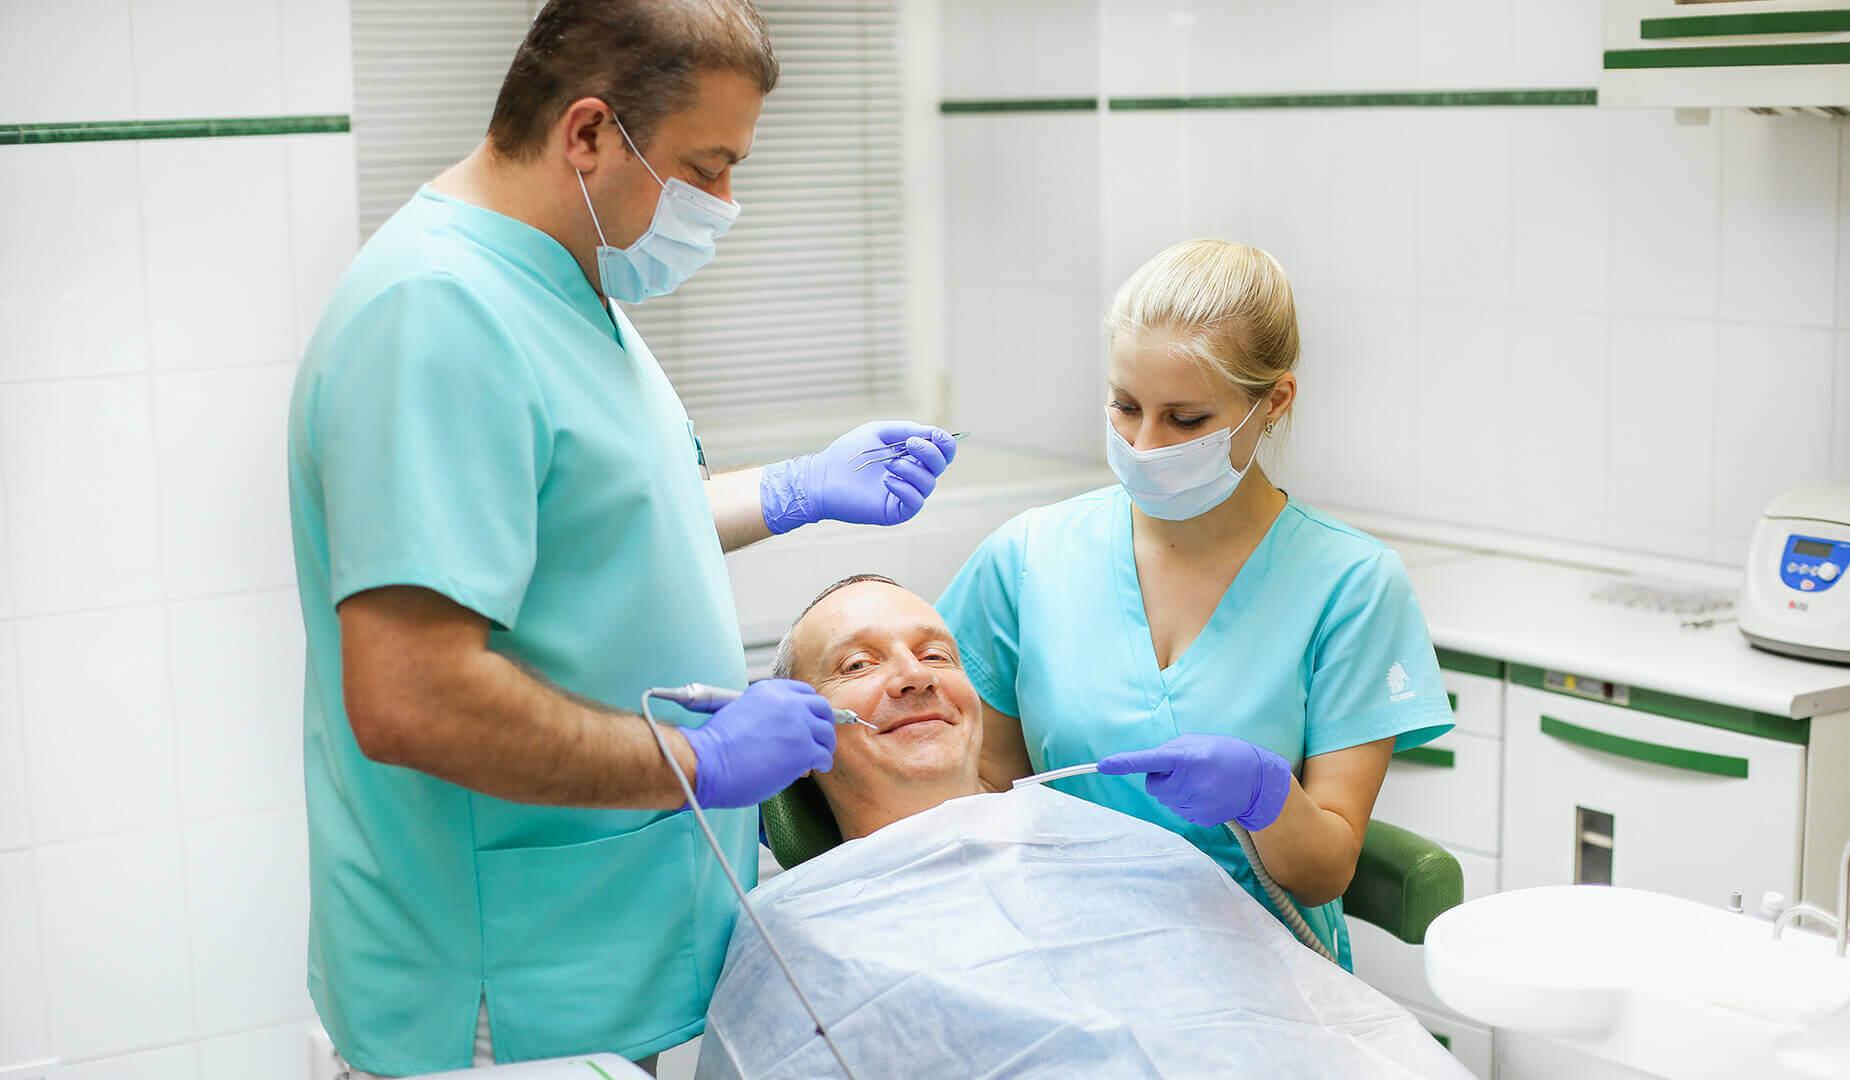 Врач осматривает пациента после операции